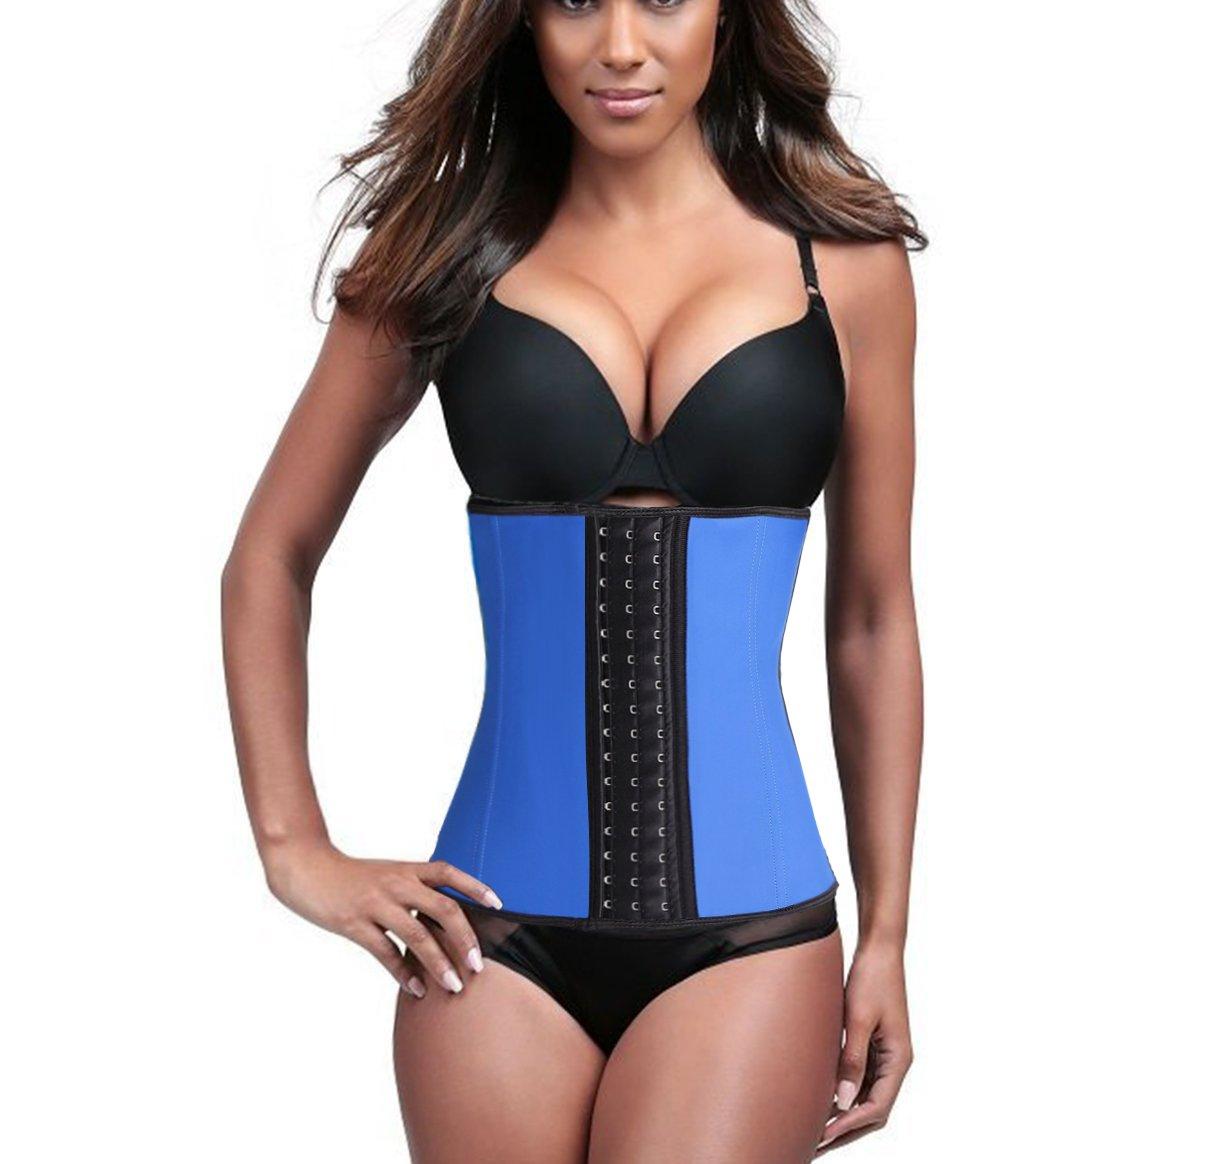 Women's Underbust Latex Girdle Waist Training Corset Hourglass Body Shaper Blue XL